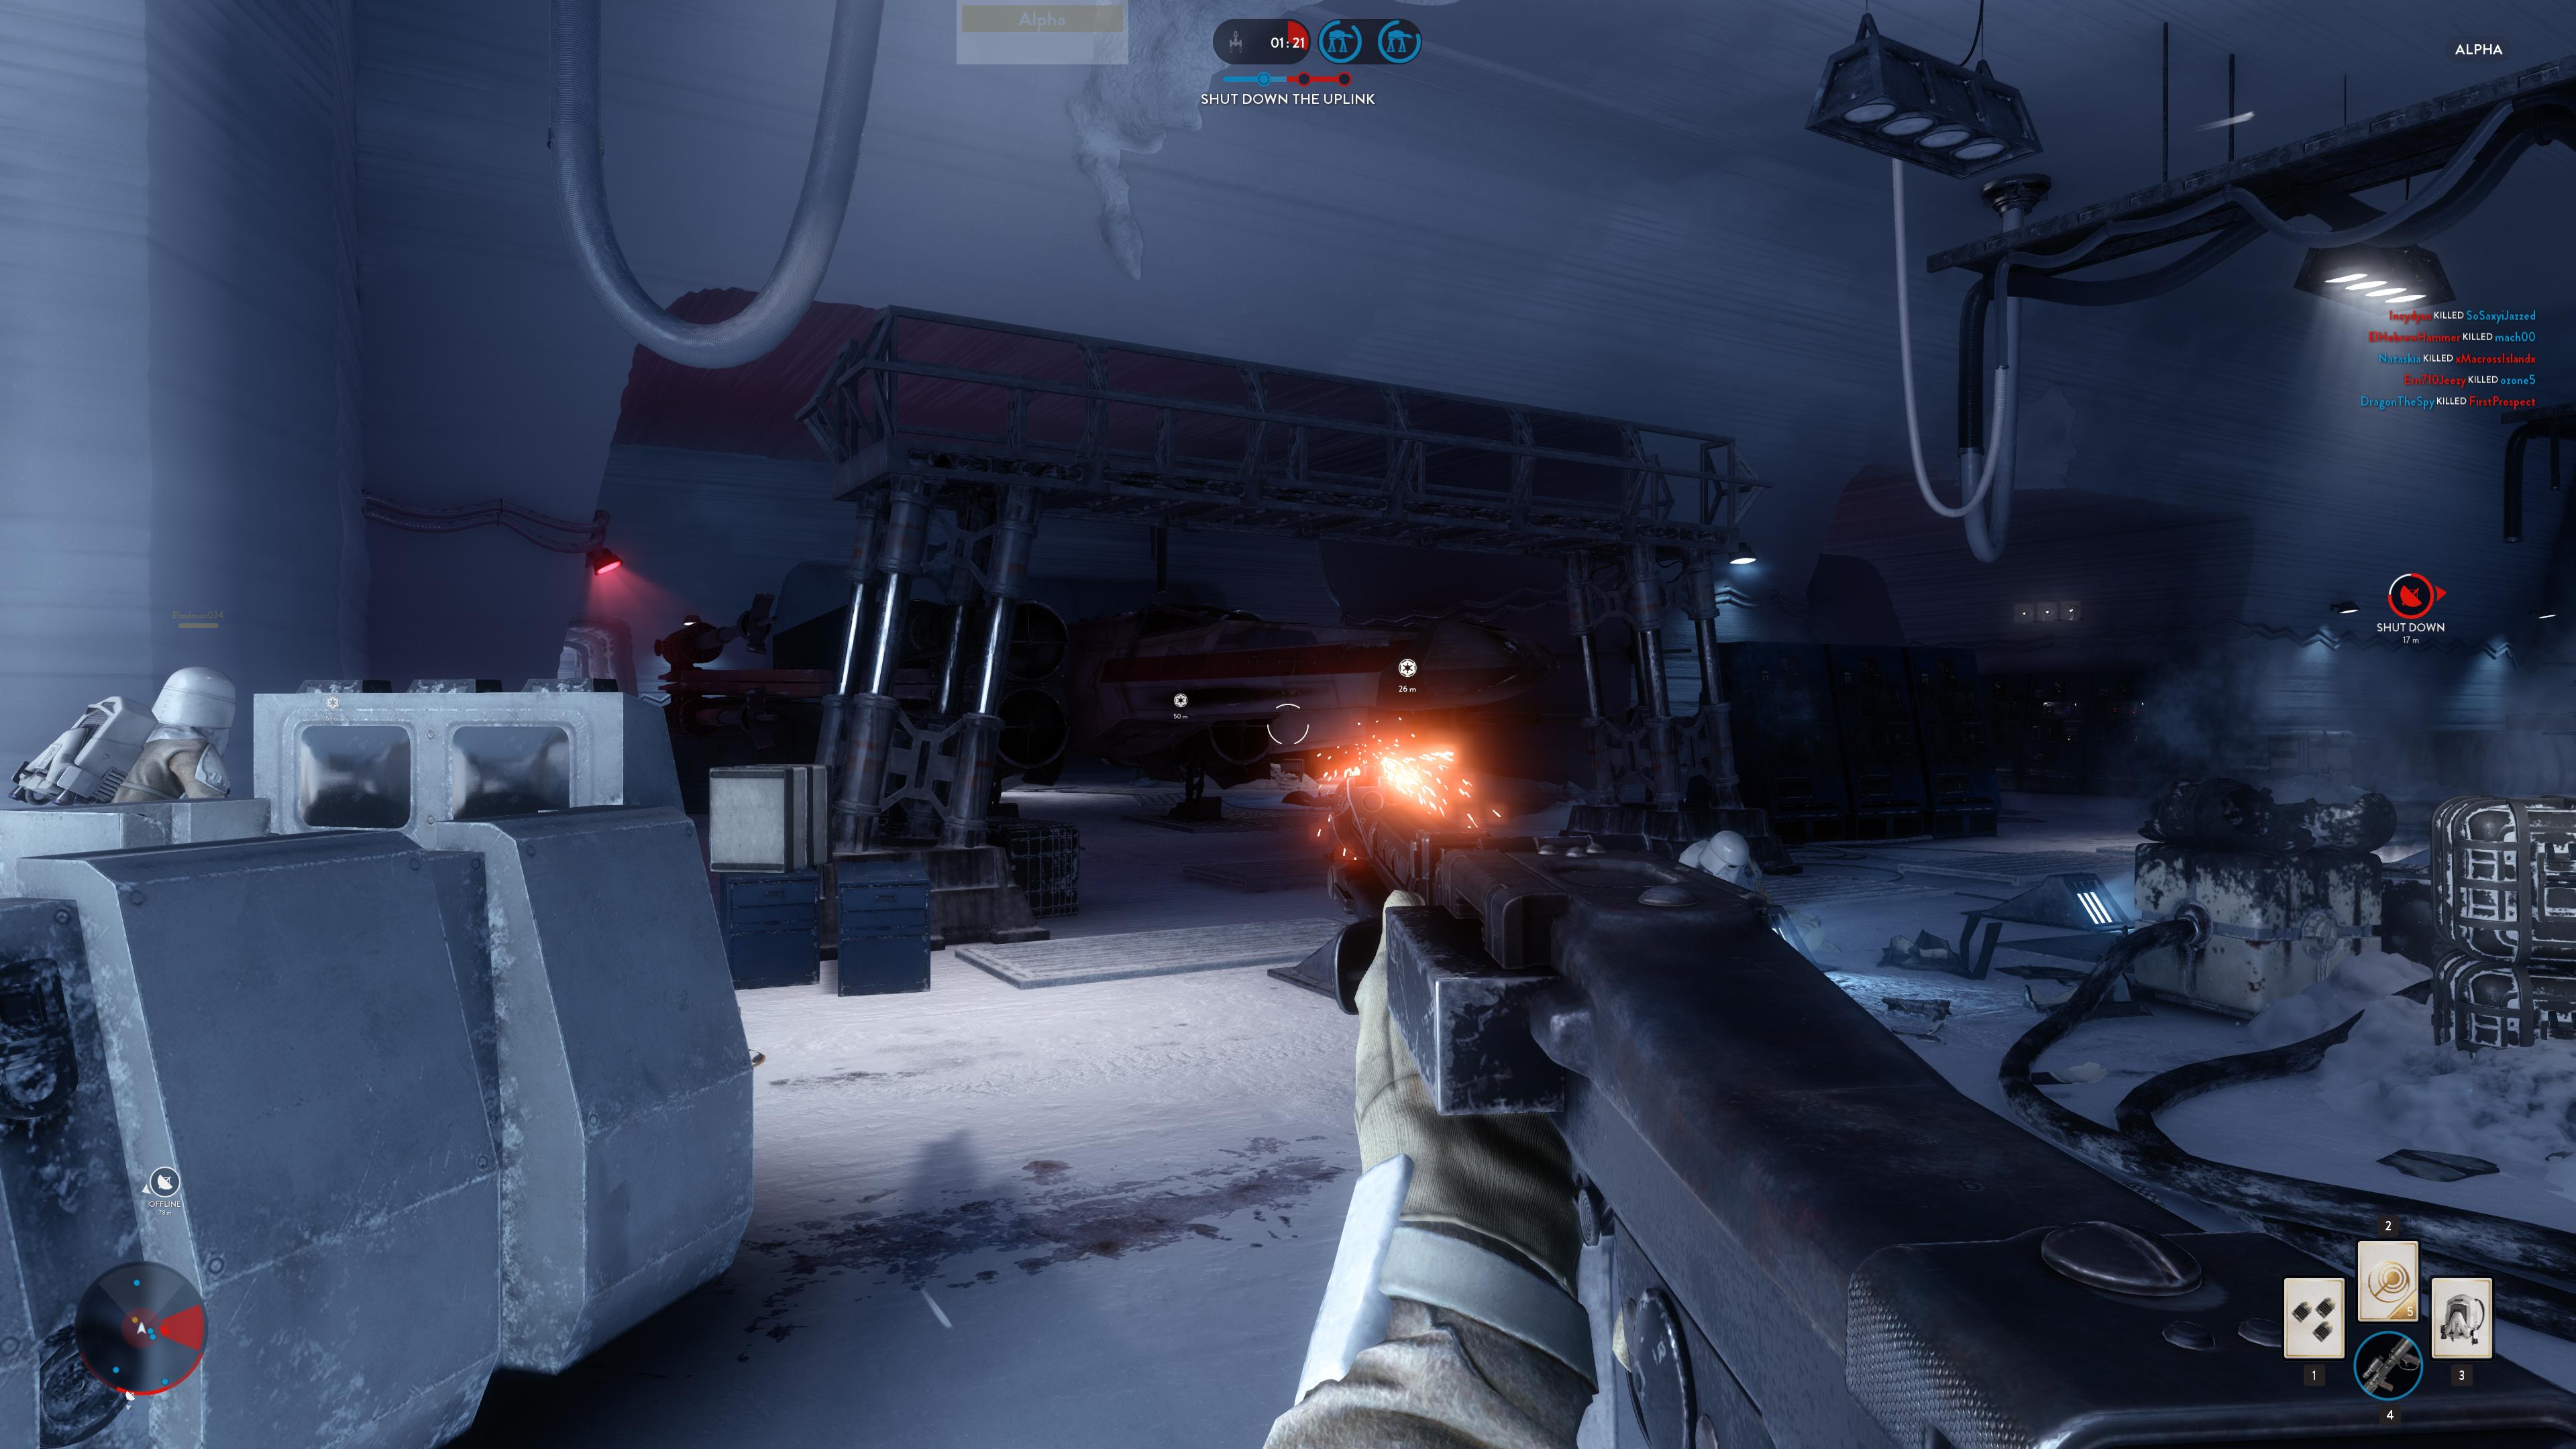 Obrazem: Boj na planetě Hoth ze Star Wars: Battlefront 111214